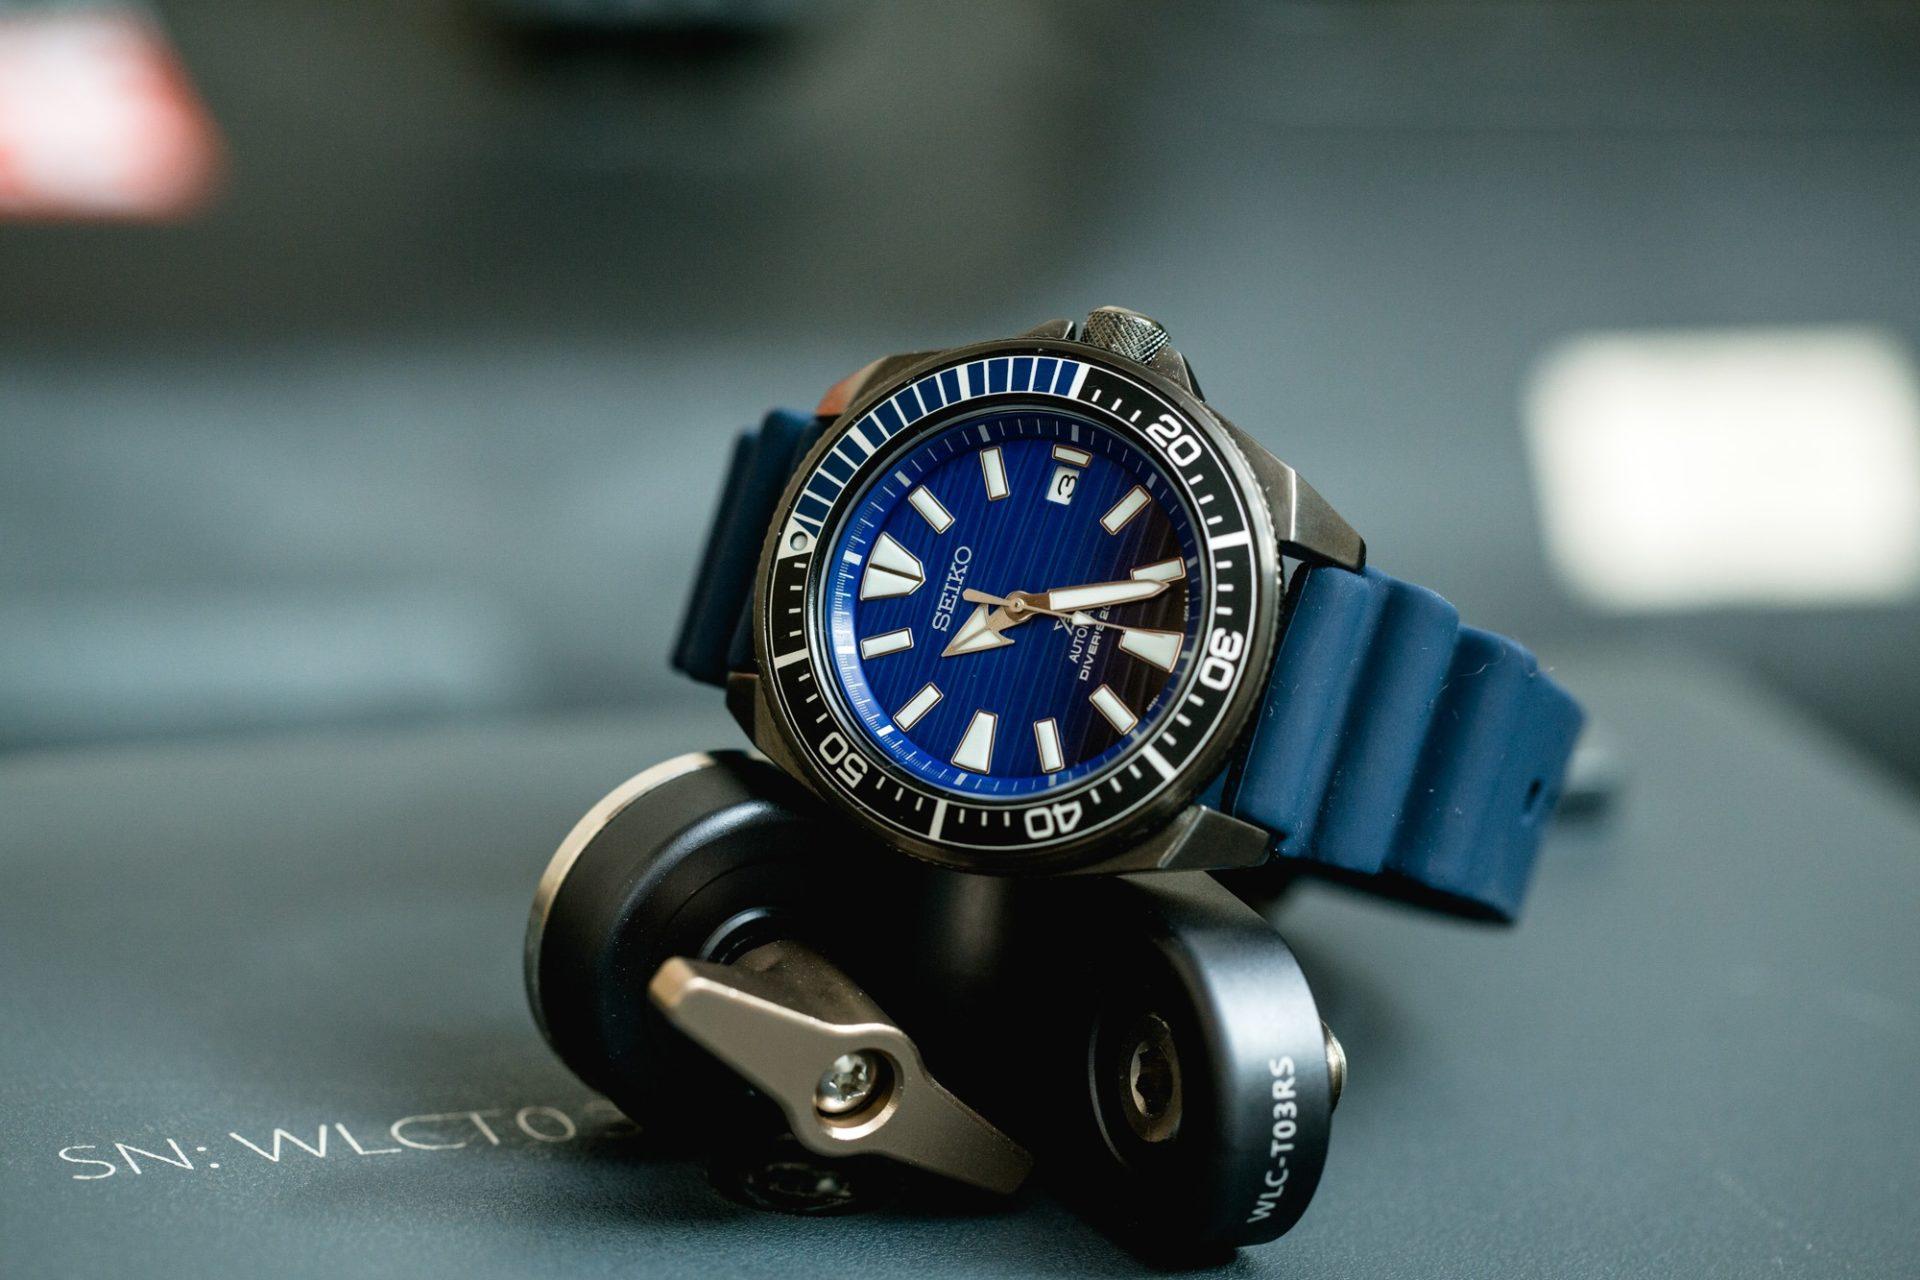 Seiko Prospex SRPD09 - Save the Ocean